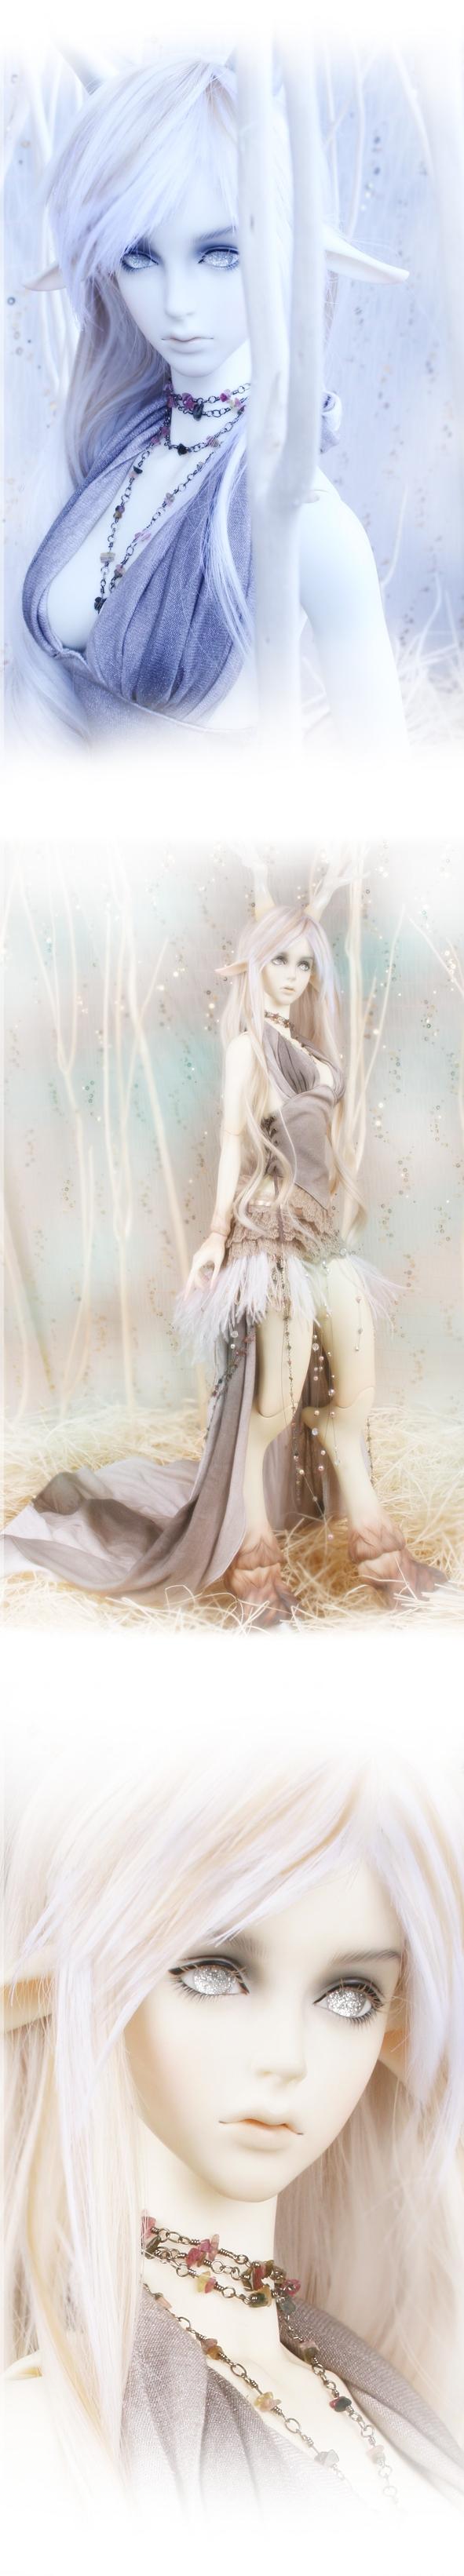 Amber-Pure Spirit bjd-1.jpg